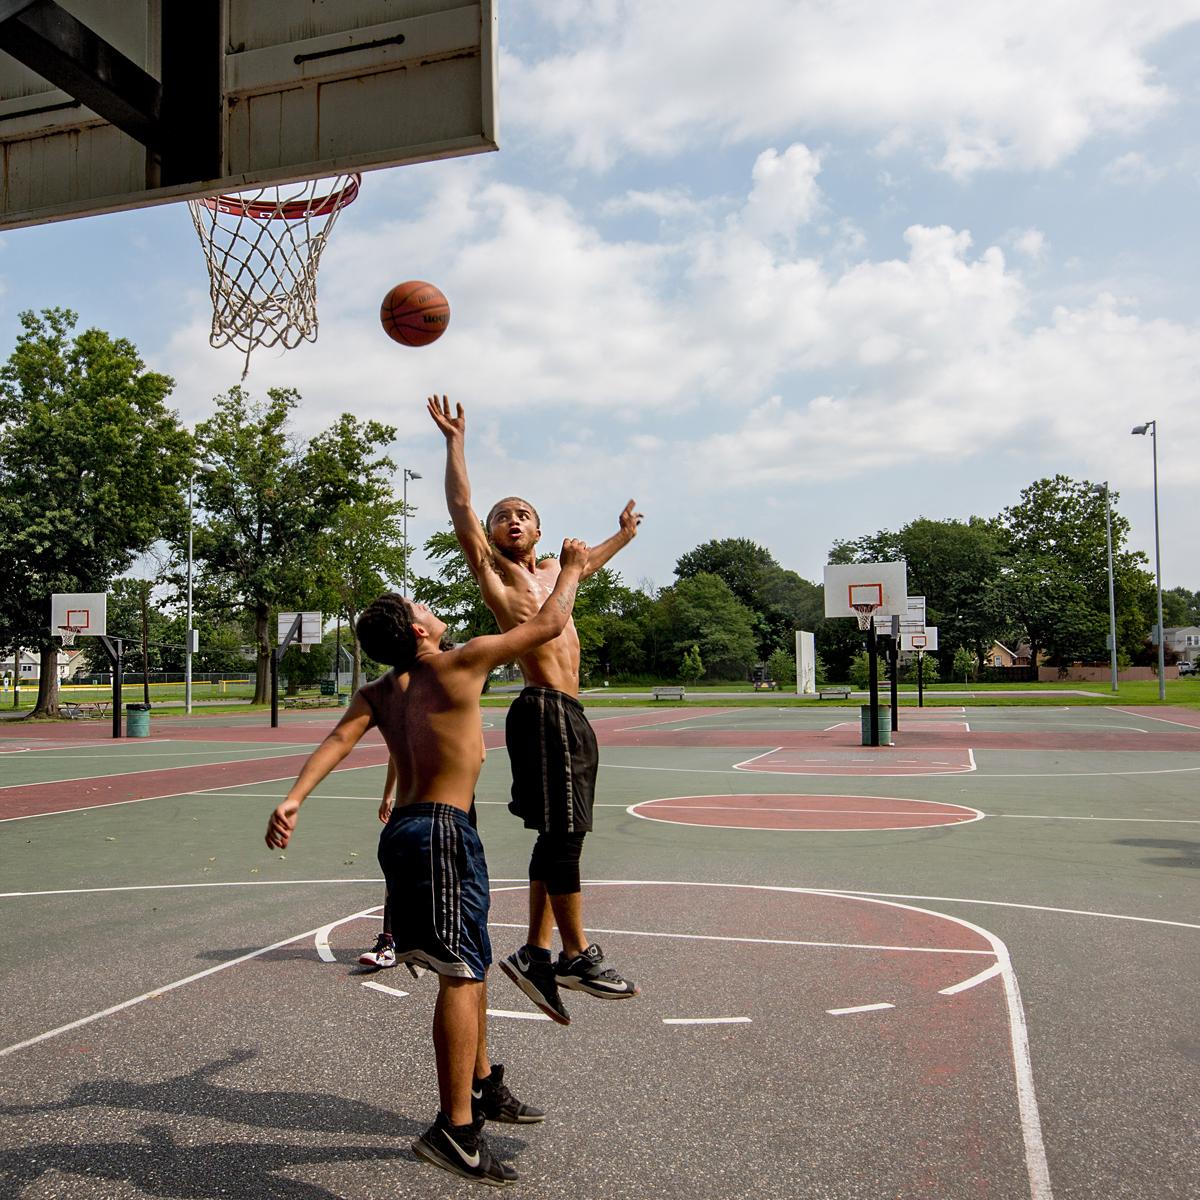 Warriors Path State Park Basketball Court: Camden County, NJ